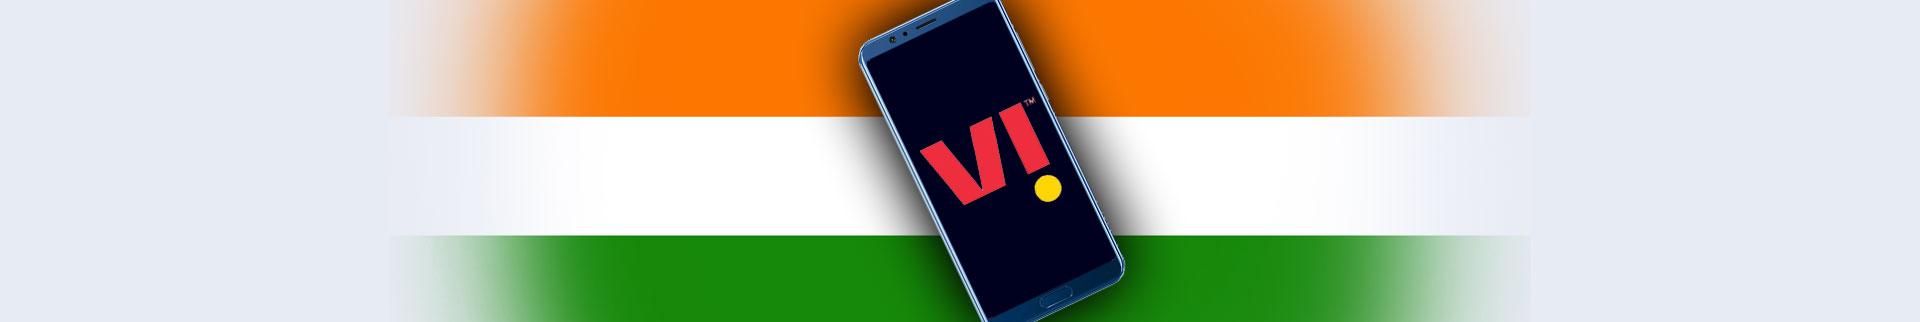 Vodafone wins arbitration